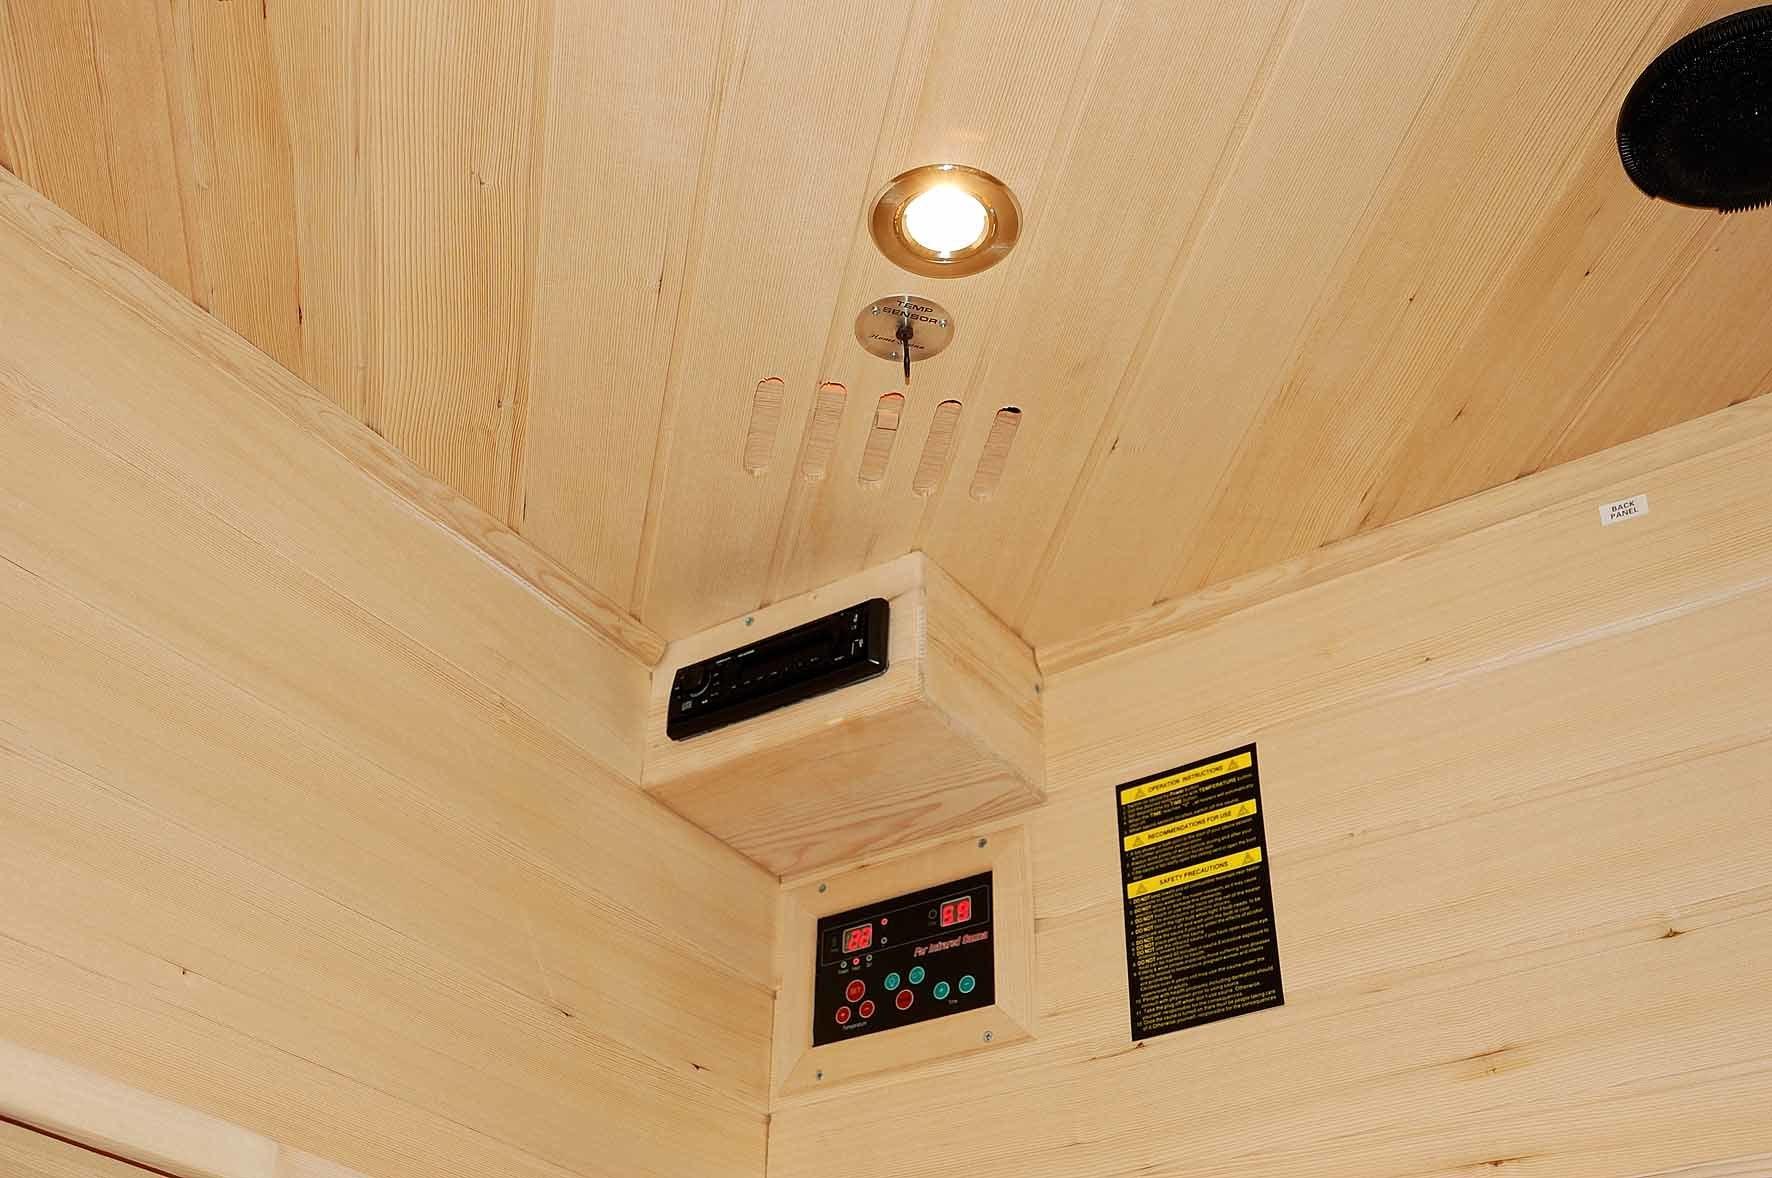 2016 Infrared Sauna Room Traditional Sauna for 3-4 People (SEK-C3C)